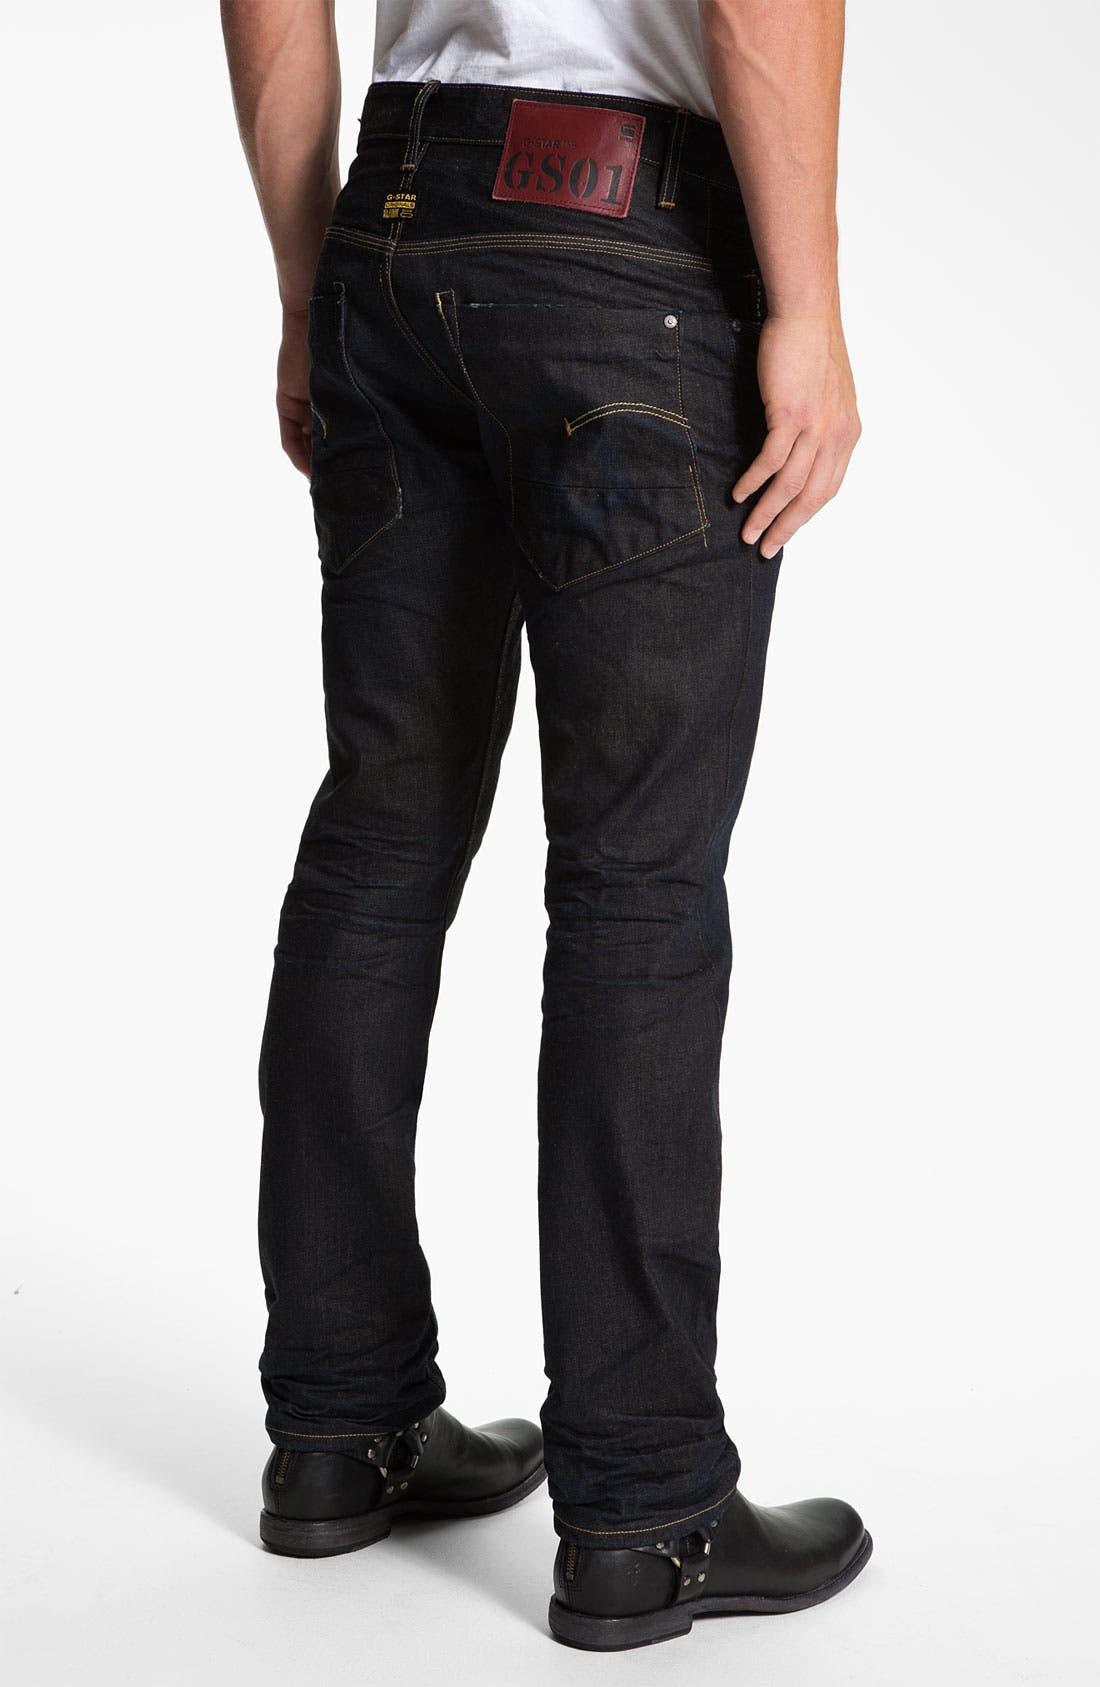 Alternate Image 1 Selected - G-Star Raw 'New Rader' Straight Leg Jeans (3D Dark Aged)